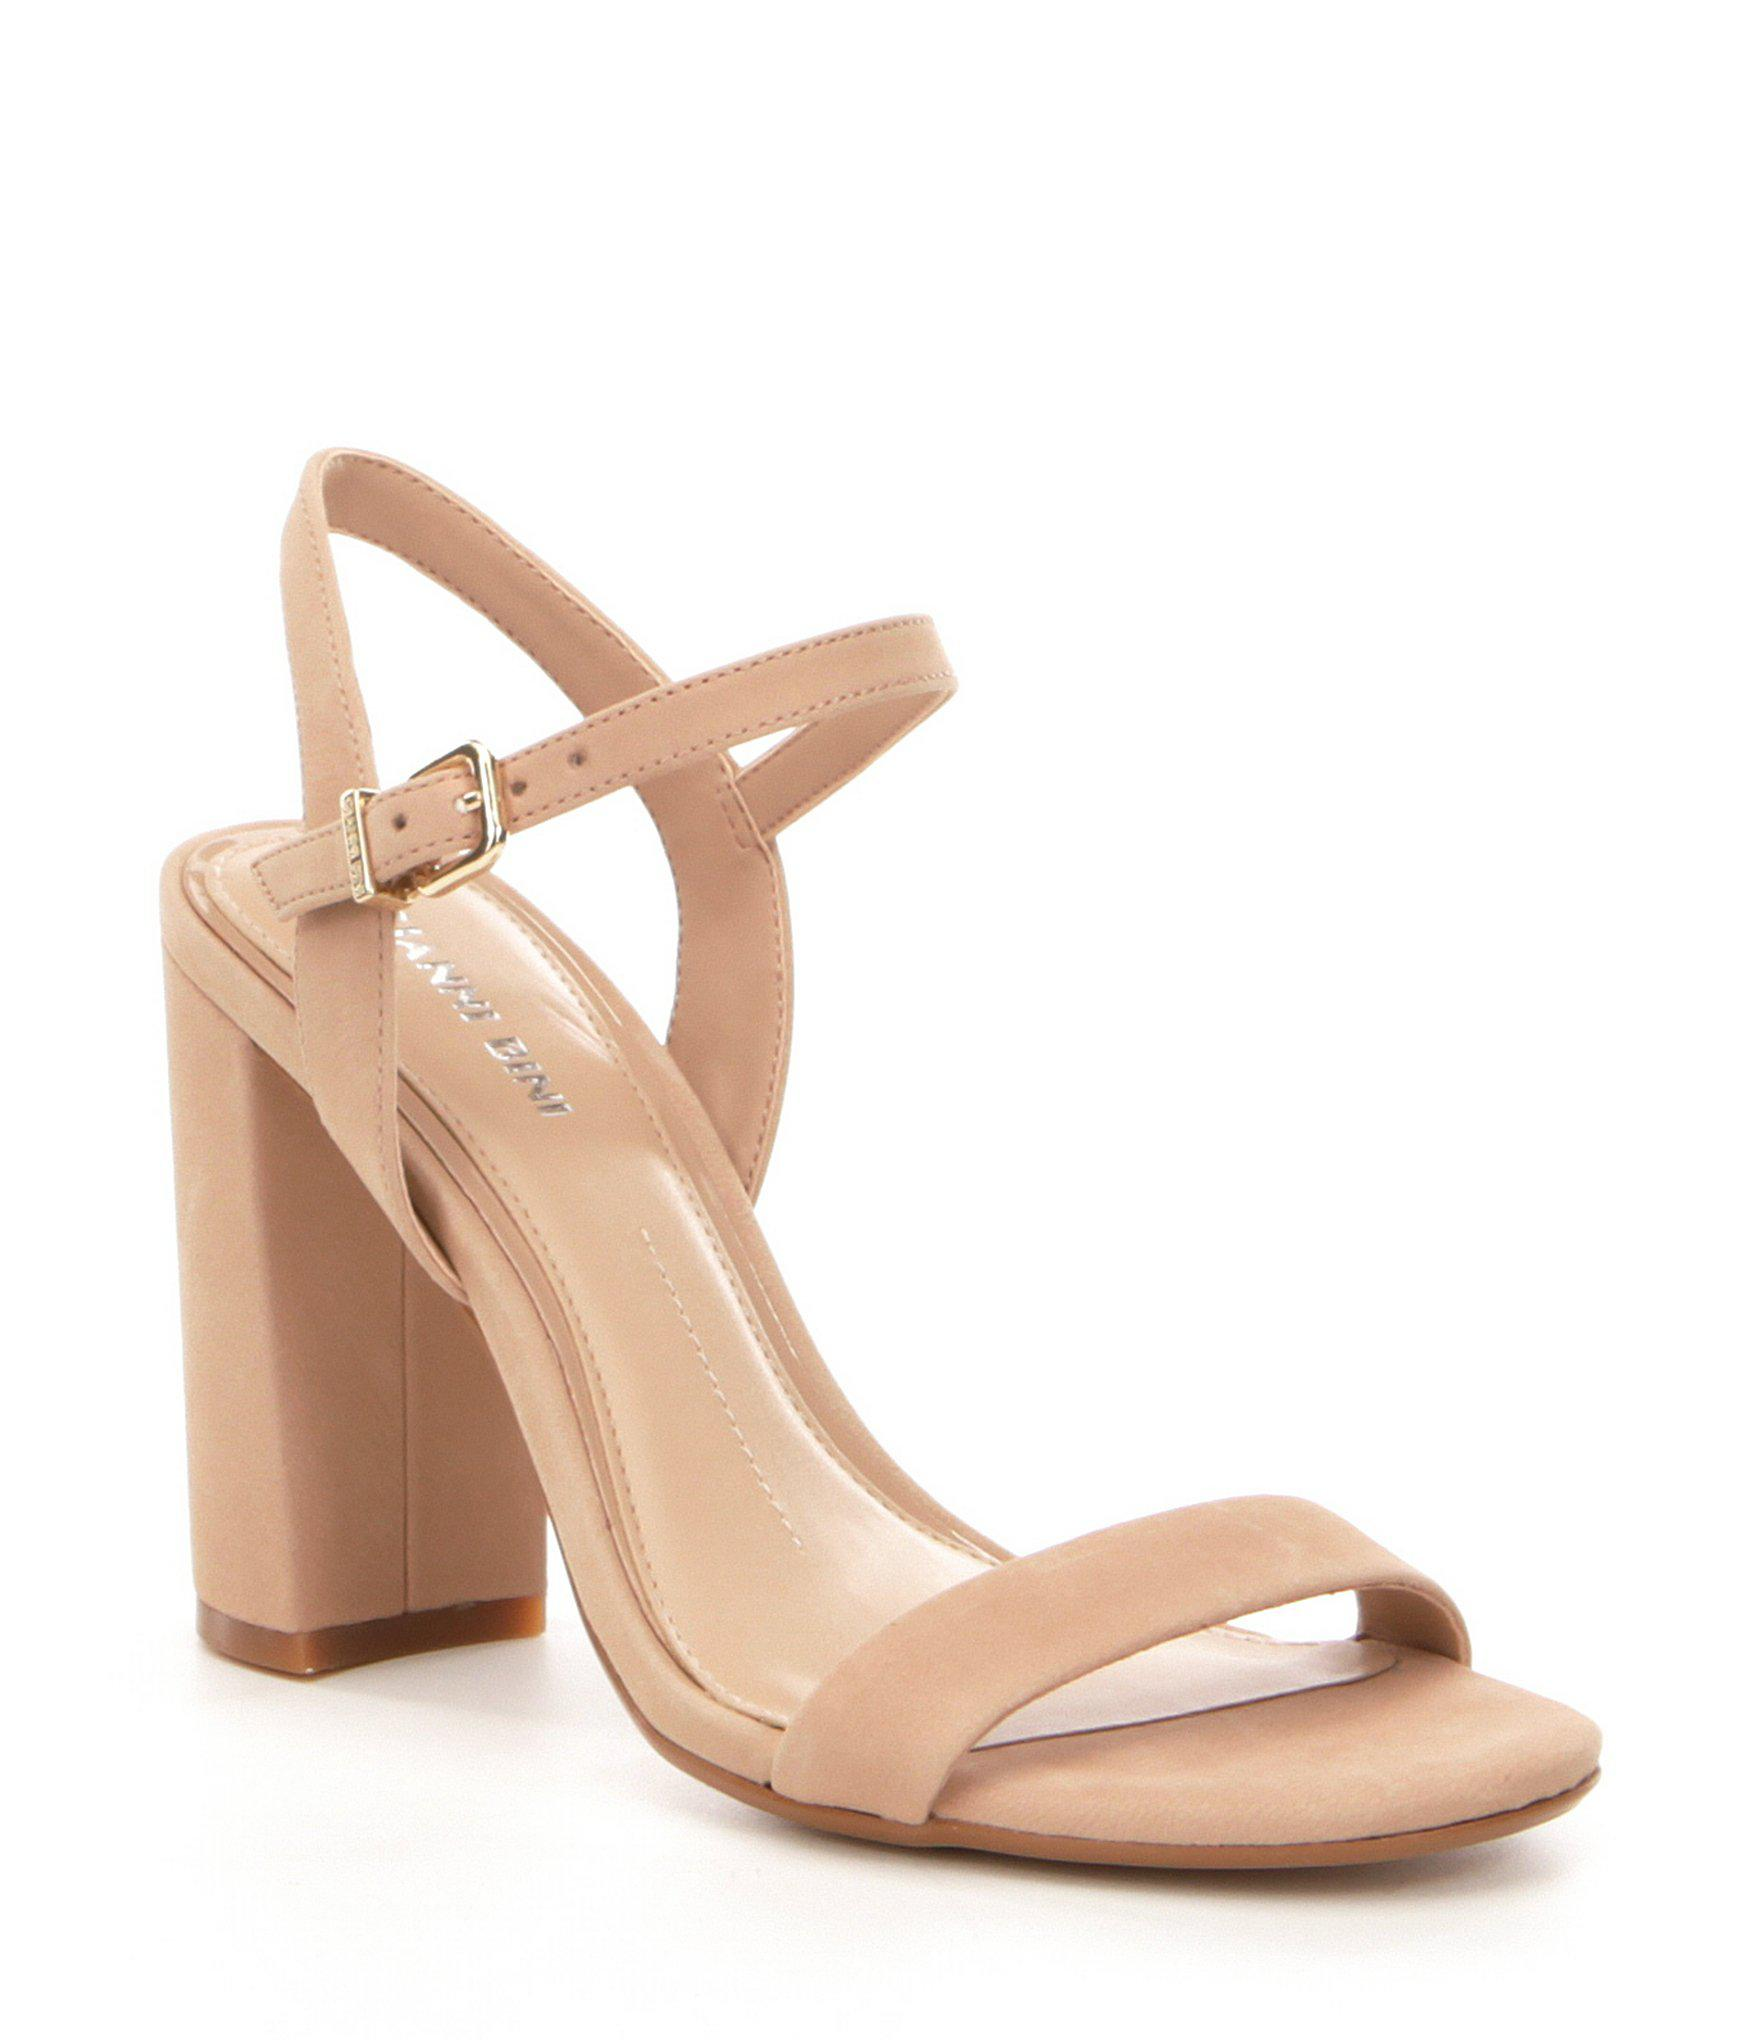 28989bced9f Lyst - Gianni Bini Mckaria Block Heel Dress Sandals in Pink